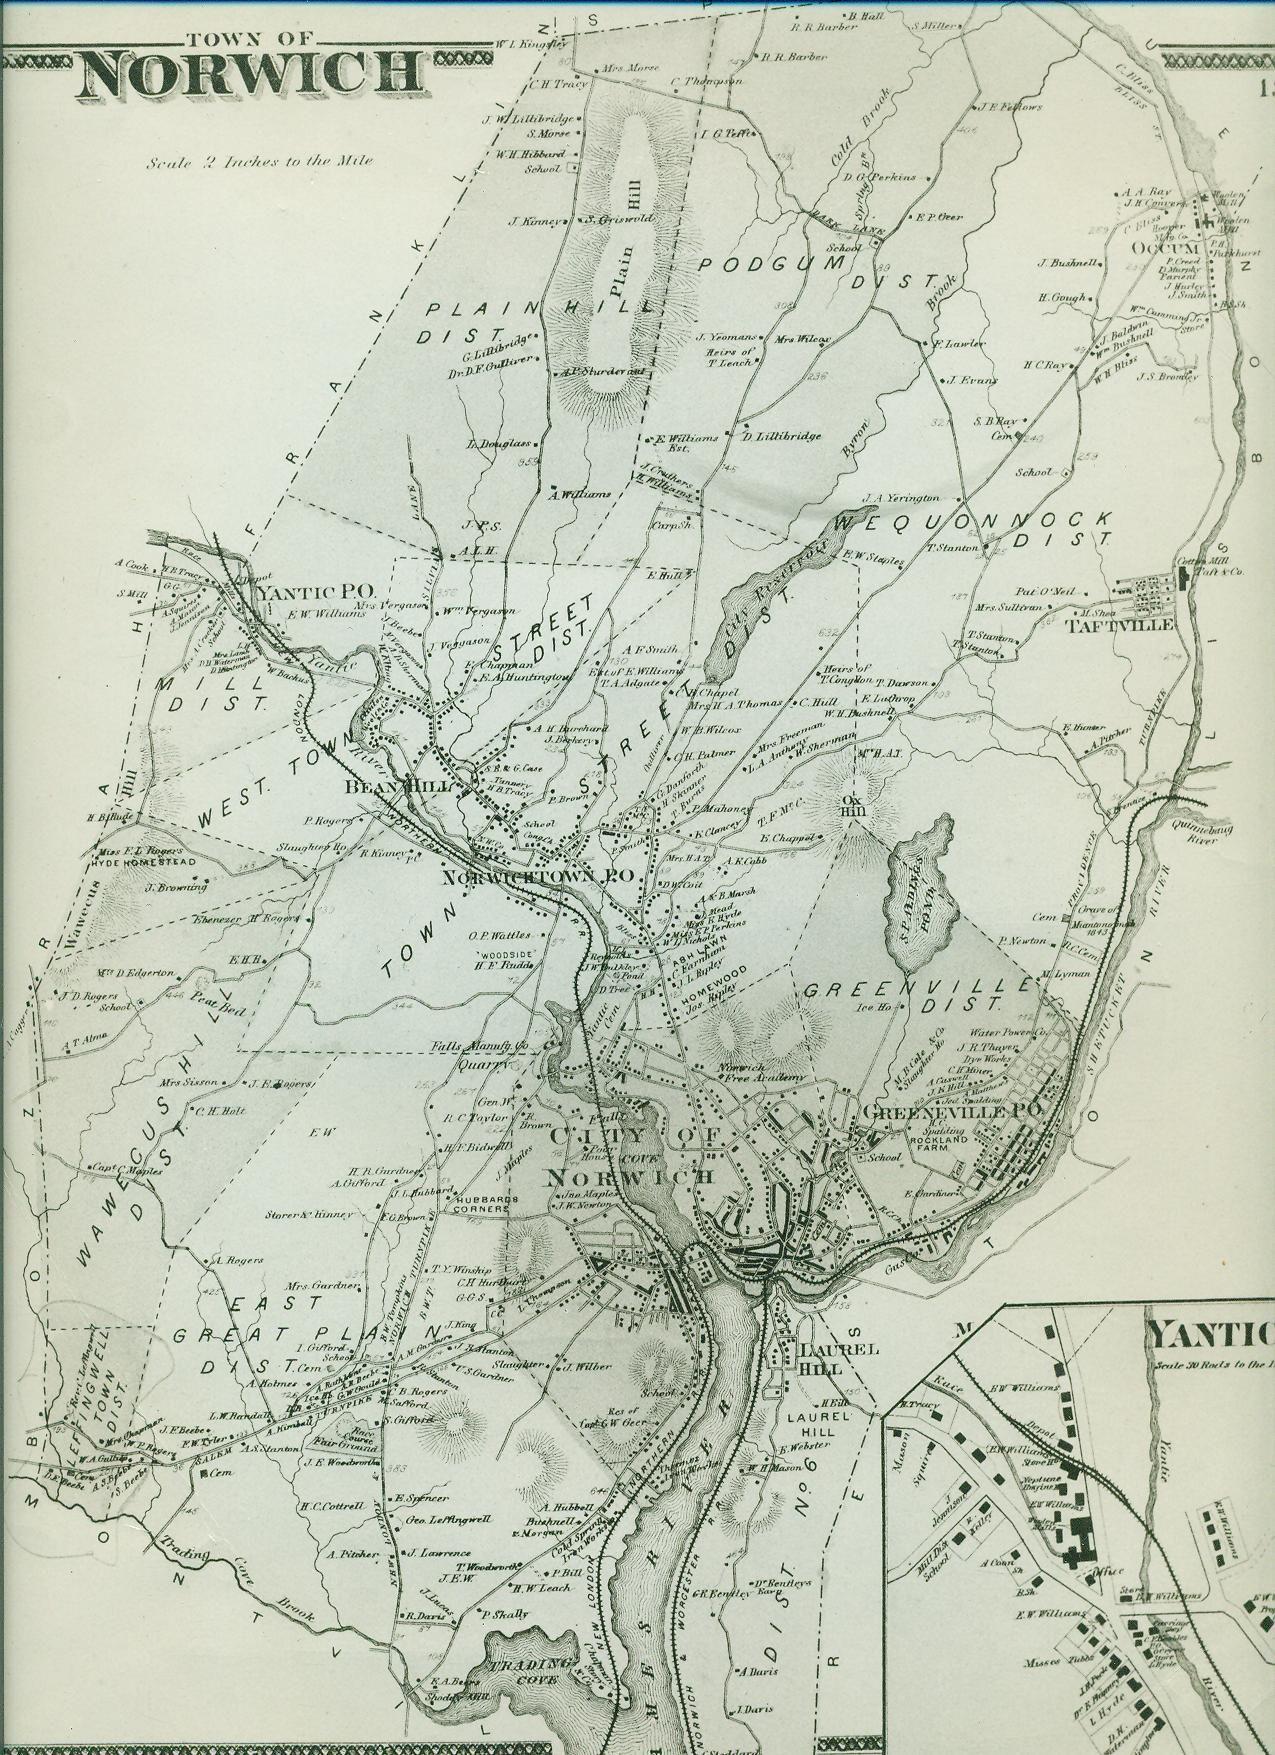 Norwich, CT--map | Norwich CT Local History & Genealogy | Pinterest ...